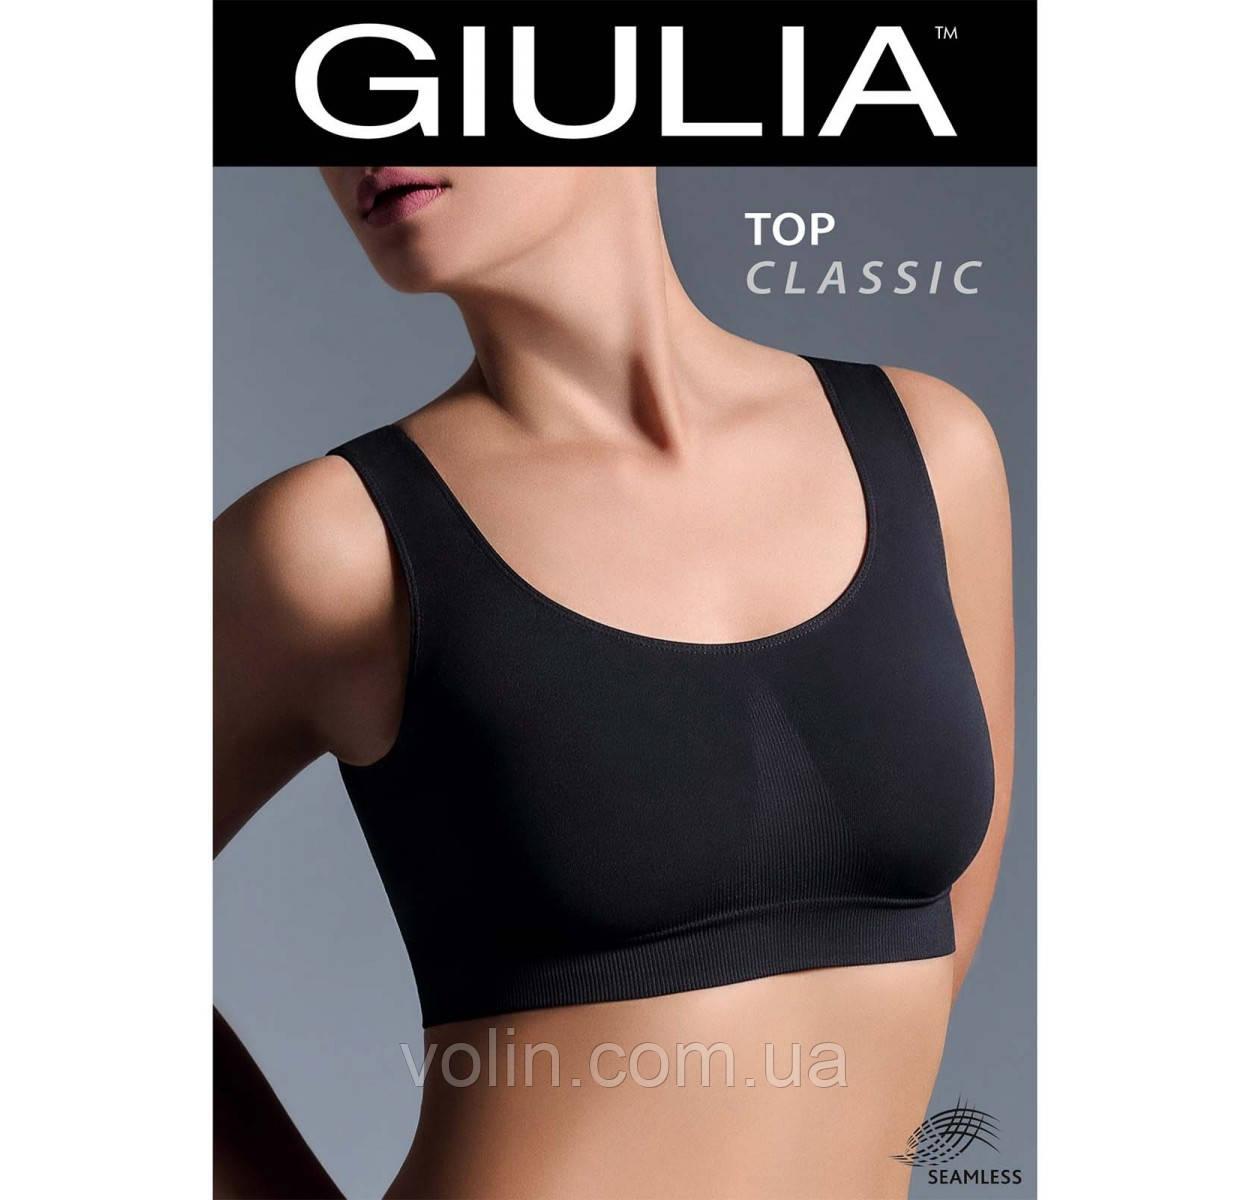 Топ женский Giulia Top Classic.